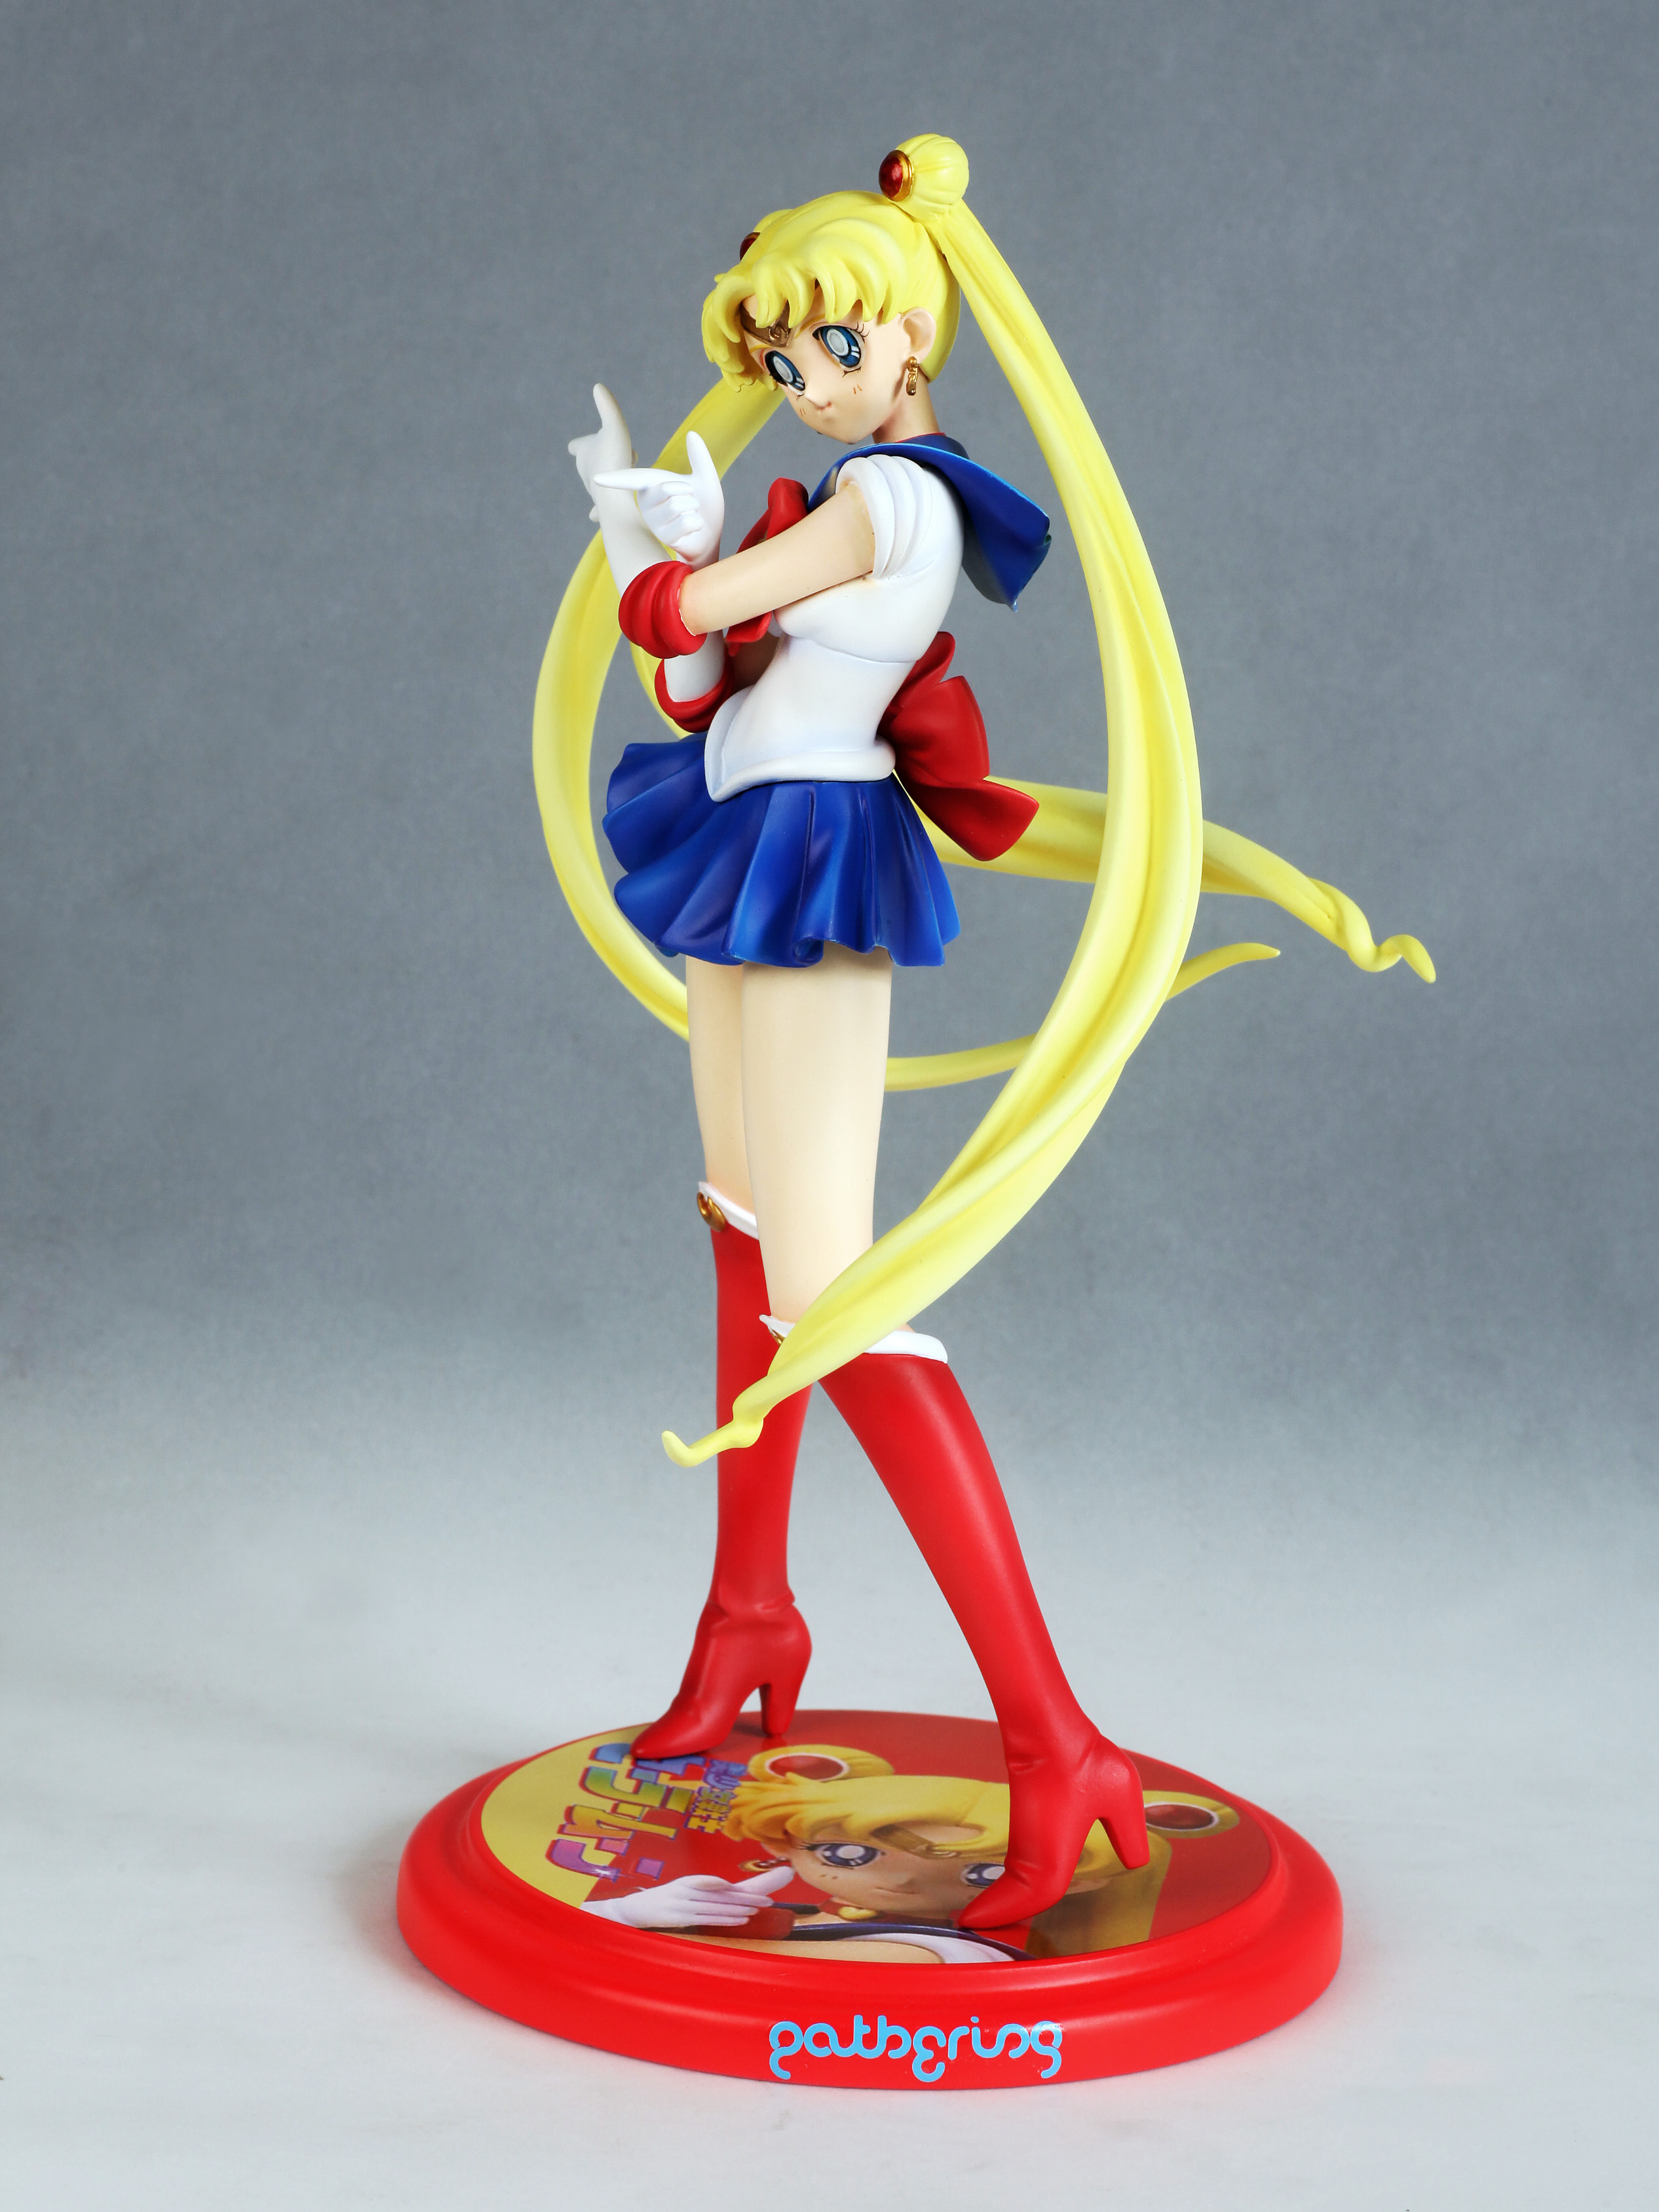 Sailor Moon Usagi Tsukino prepainted figure haruhichan.com Sailor Moon Anime figure 02